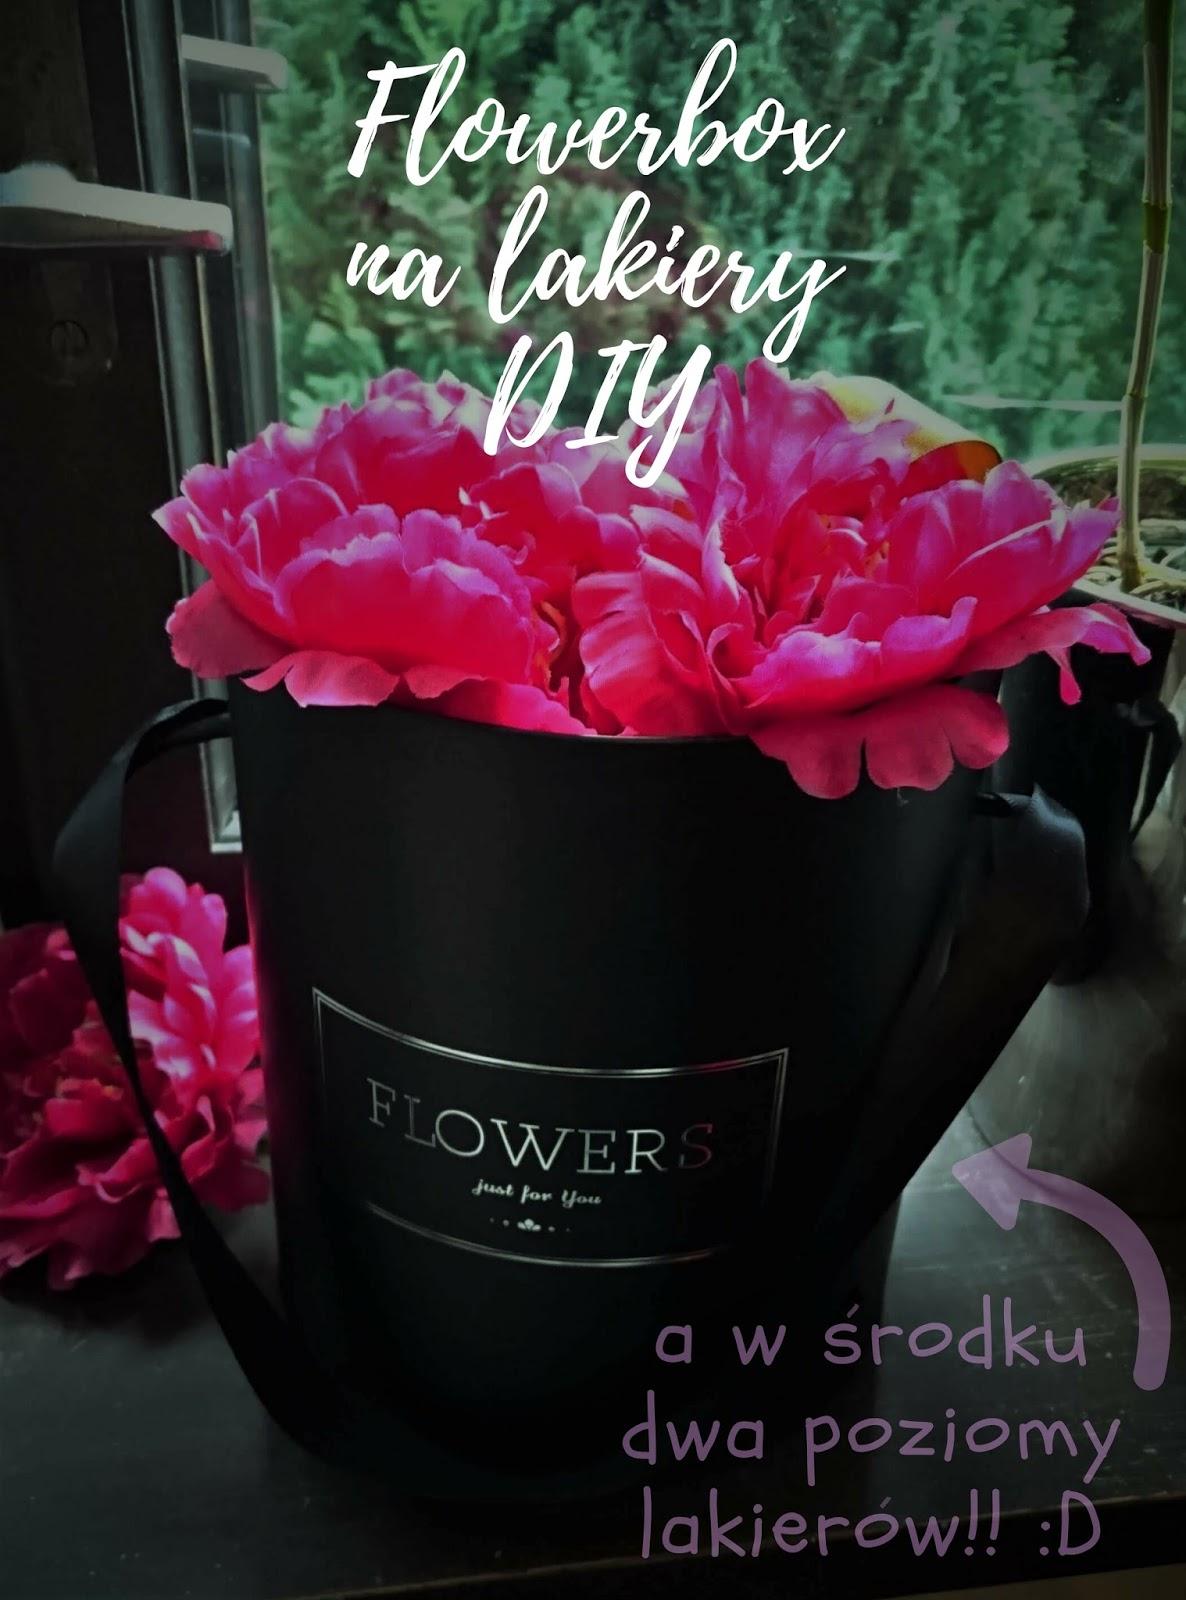 Flowerbox na... lakiery! :D